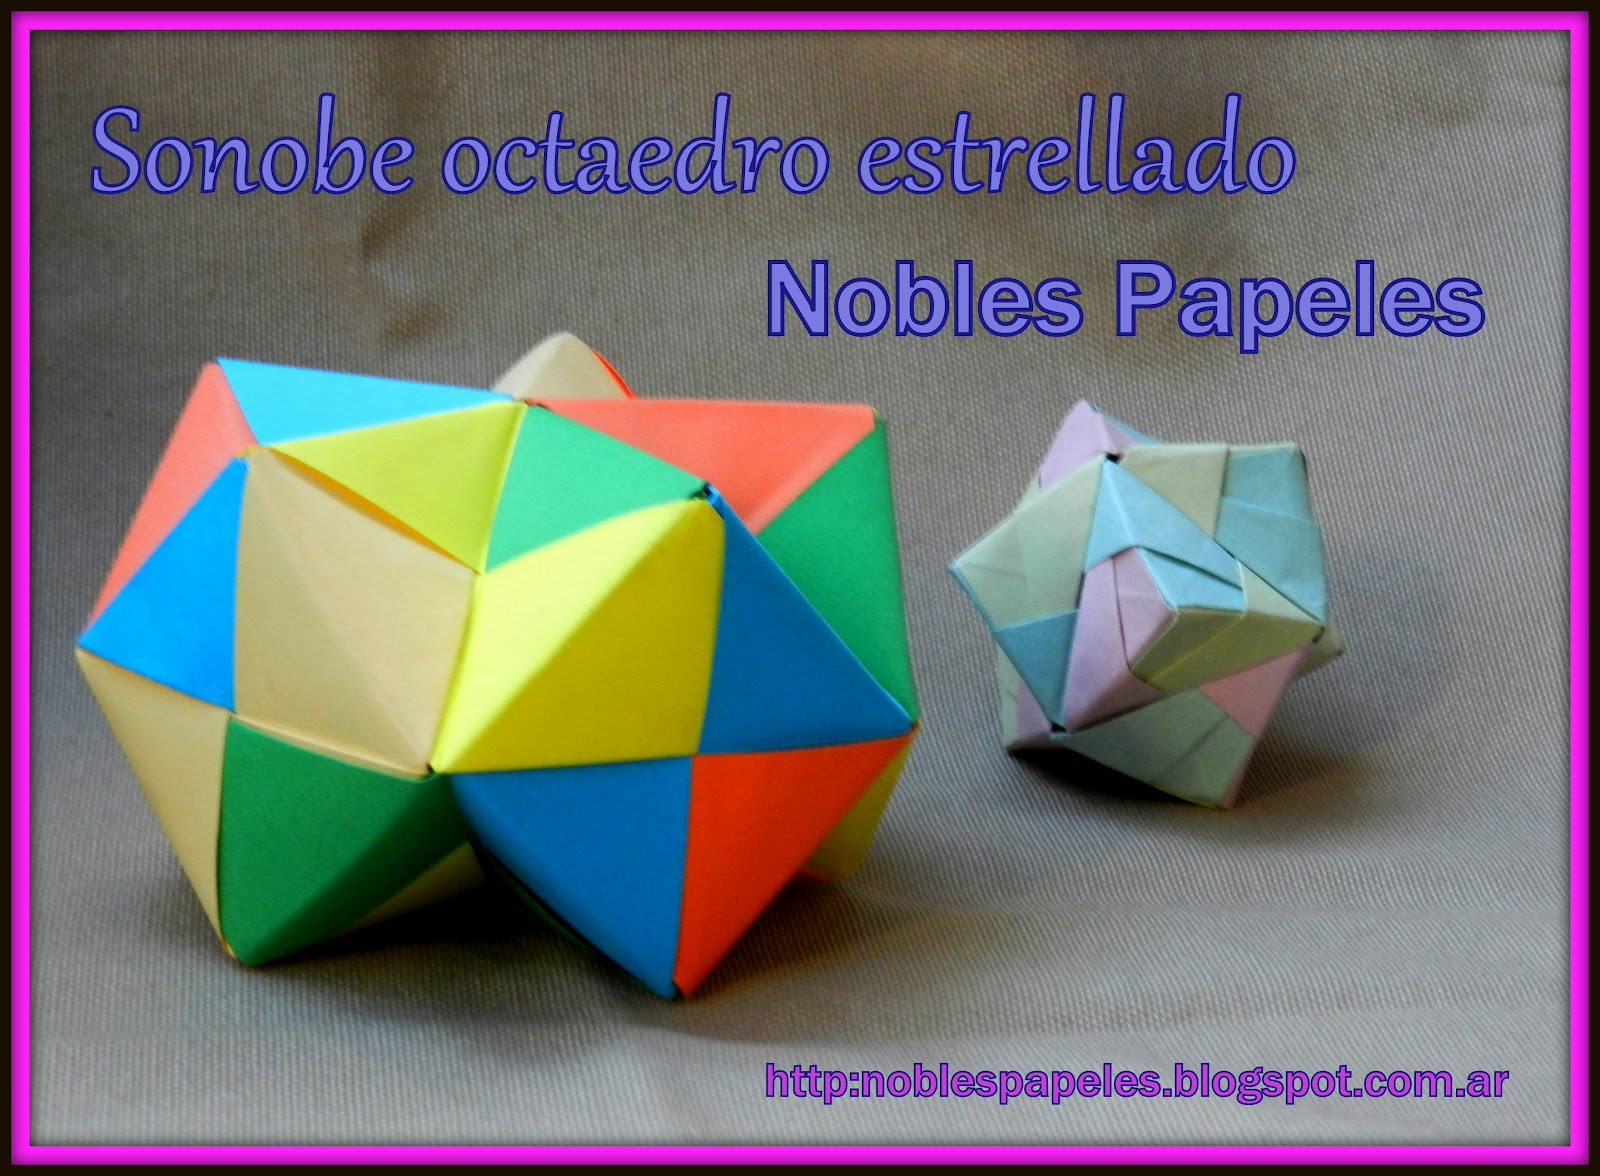 How to Make Origami Sonobe Cube | Recipe | Origami, Origami cube ... | 1176x1600